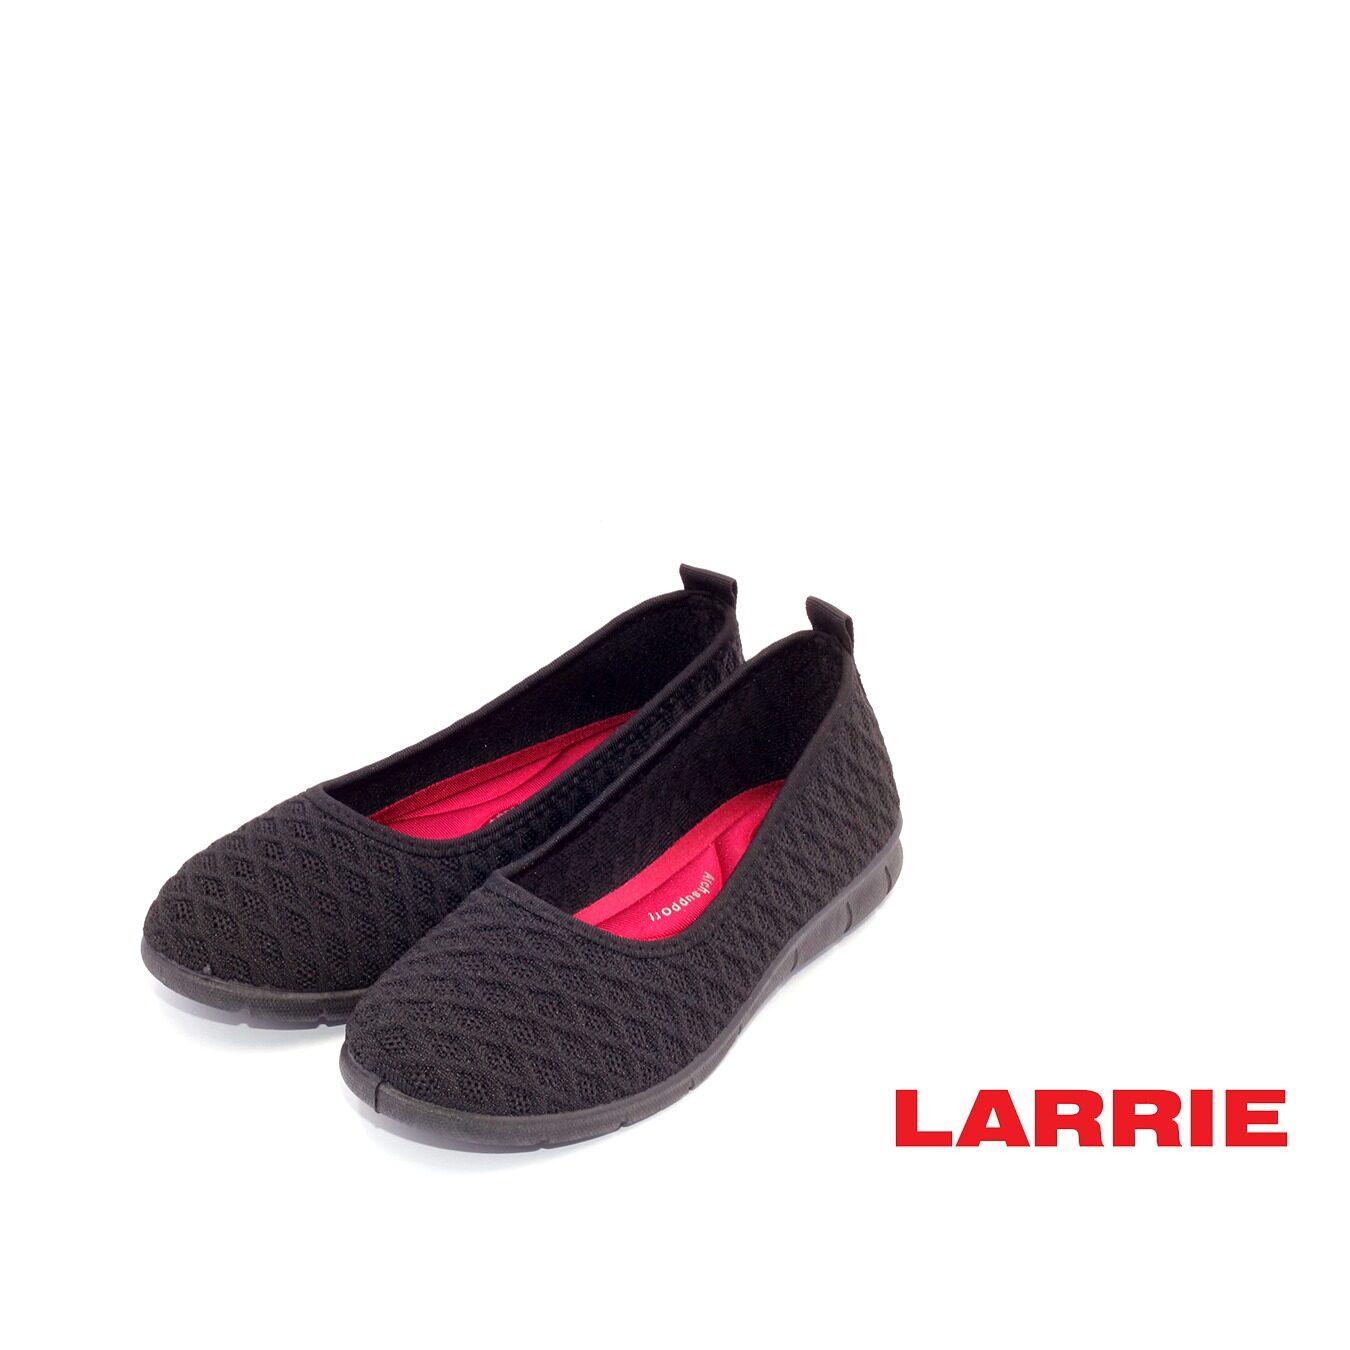 LARRIE Kasut Perempuan Light Weight Comfy Sneakers Women  - L62018-TF01SV